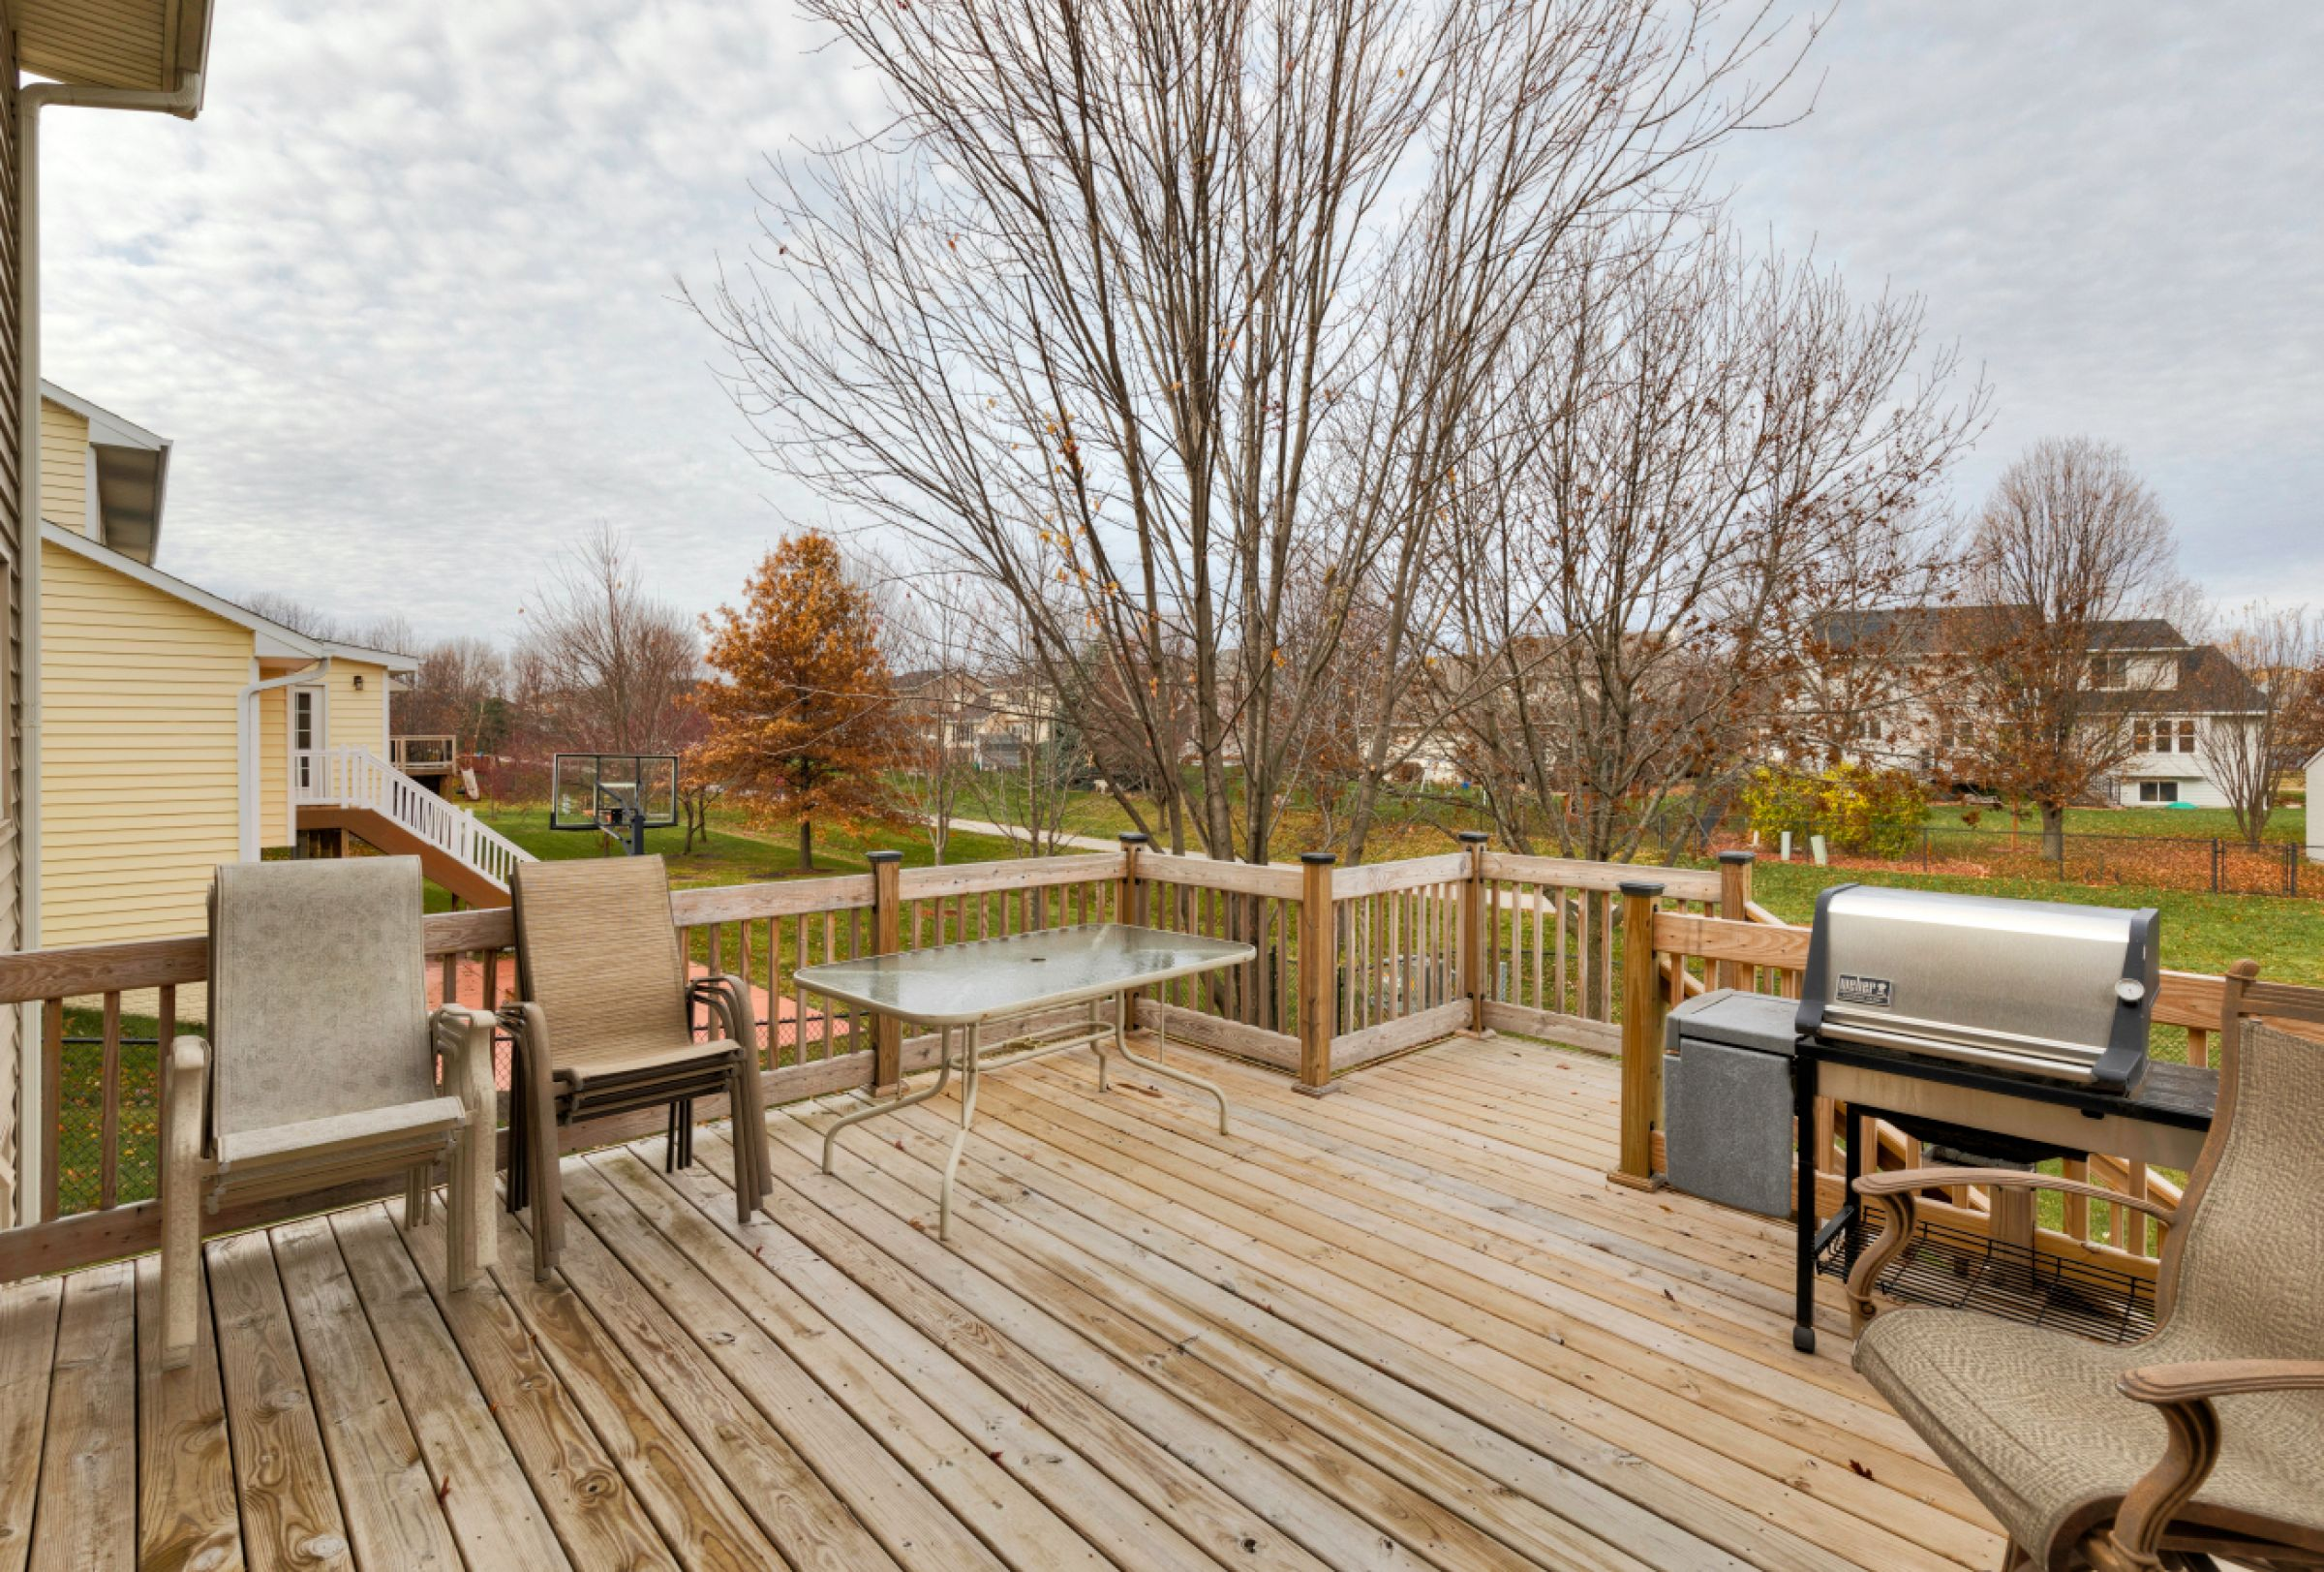 residential-polk-county-iowa-0-acres-listing-number-15248-0-2020-11-13-015442.jpg